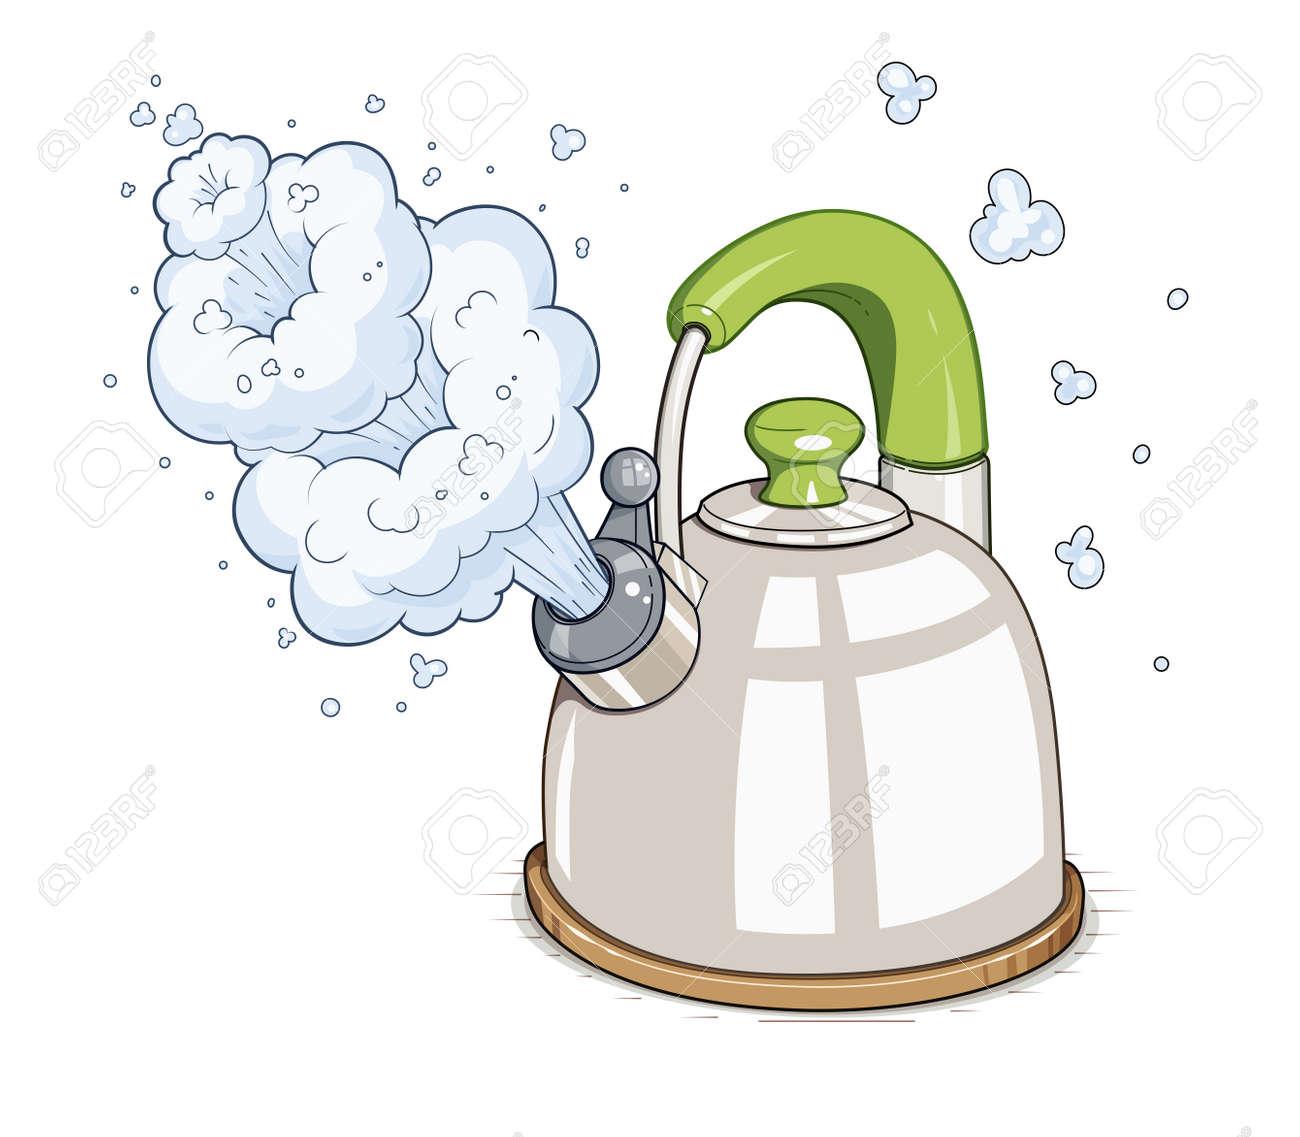 Kettle boil. illustration. Isolated on white background - 51375934